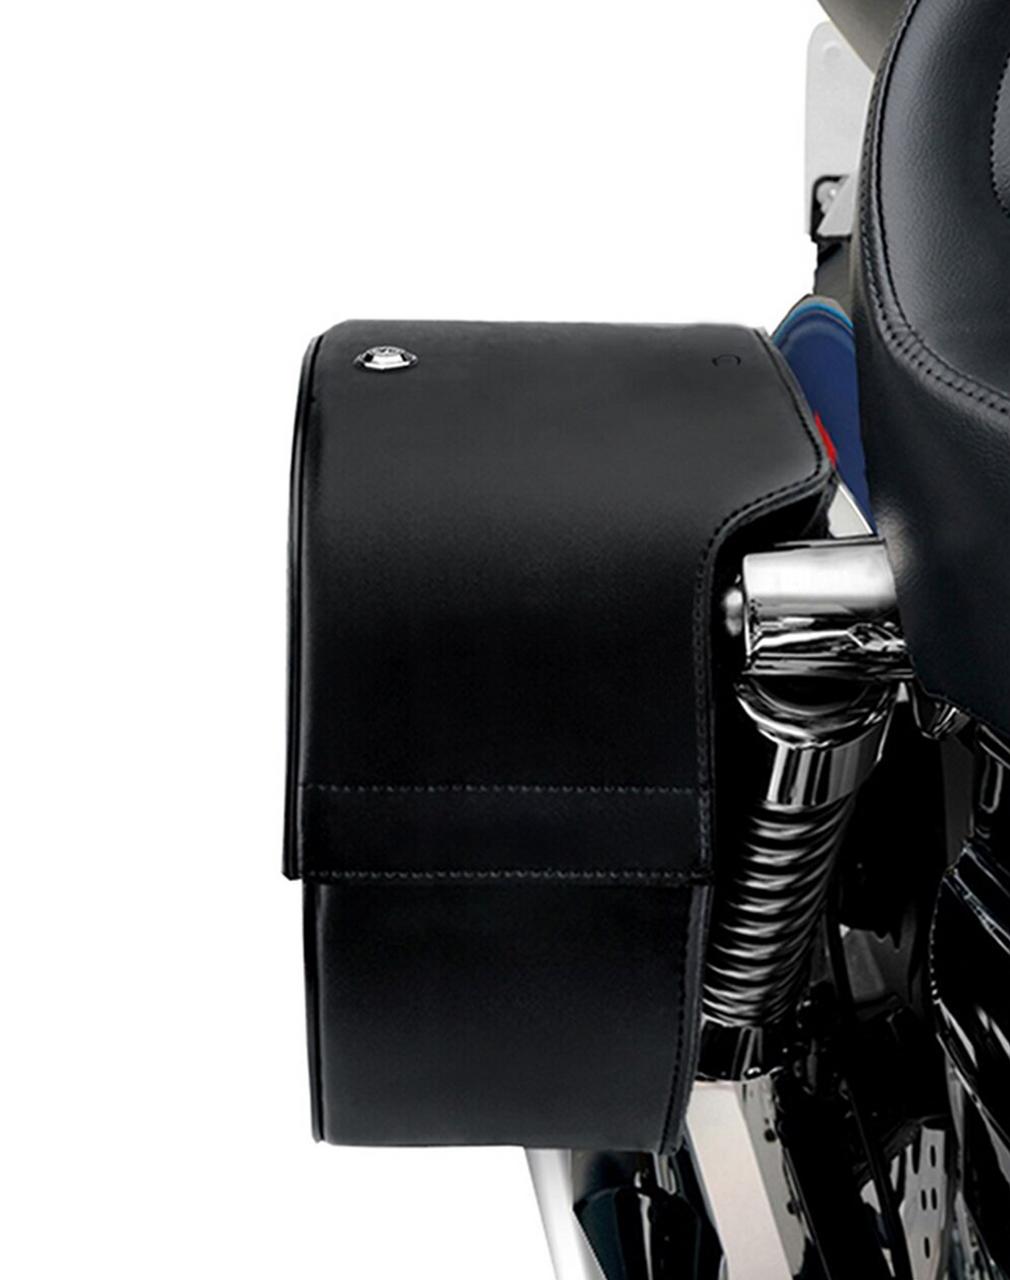 Honda Magna 750 Large Single Strap Shock Cutout Slanted Motorcycle Saddlebags shock cutout view